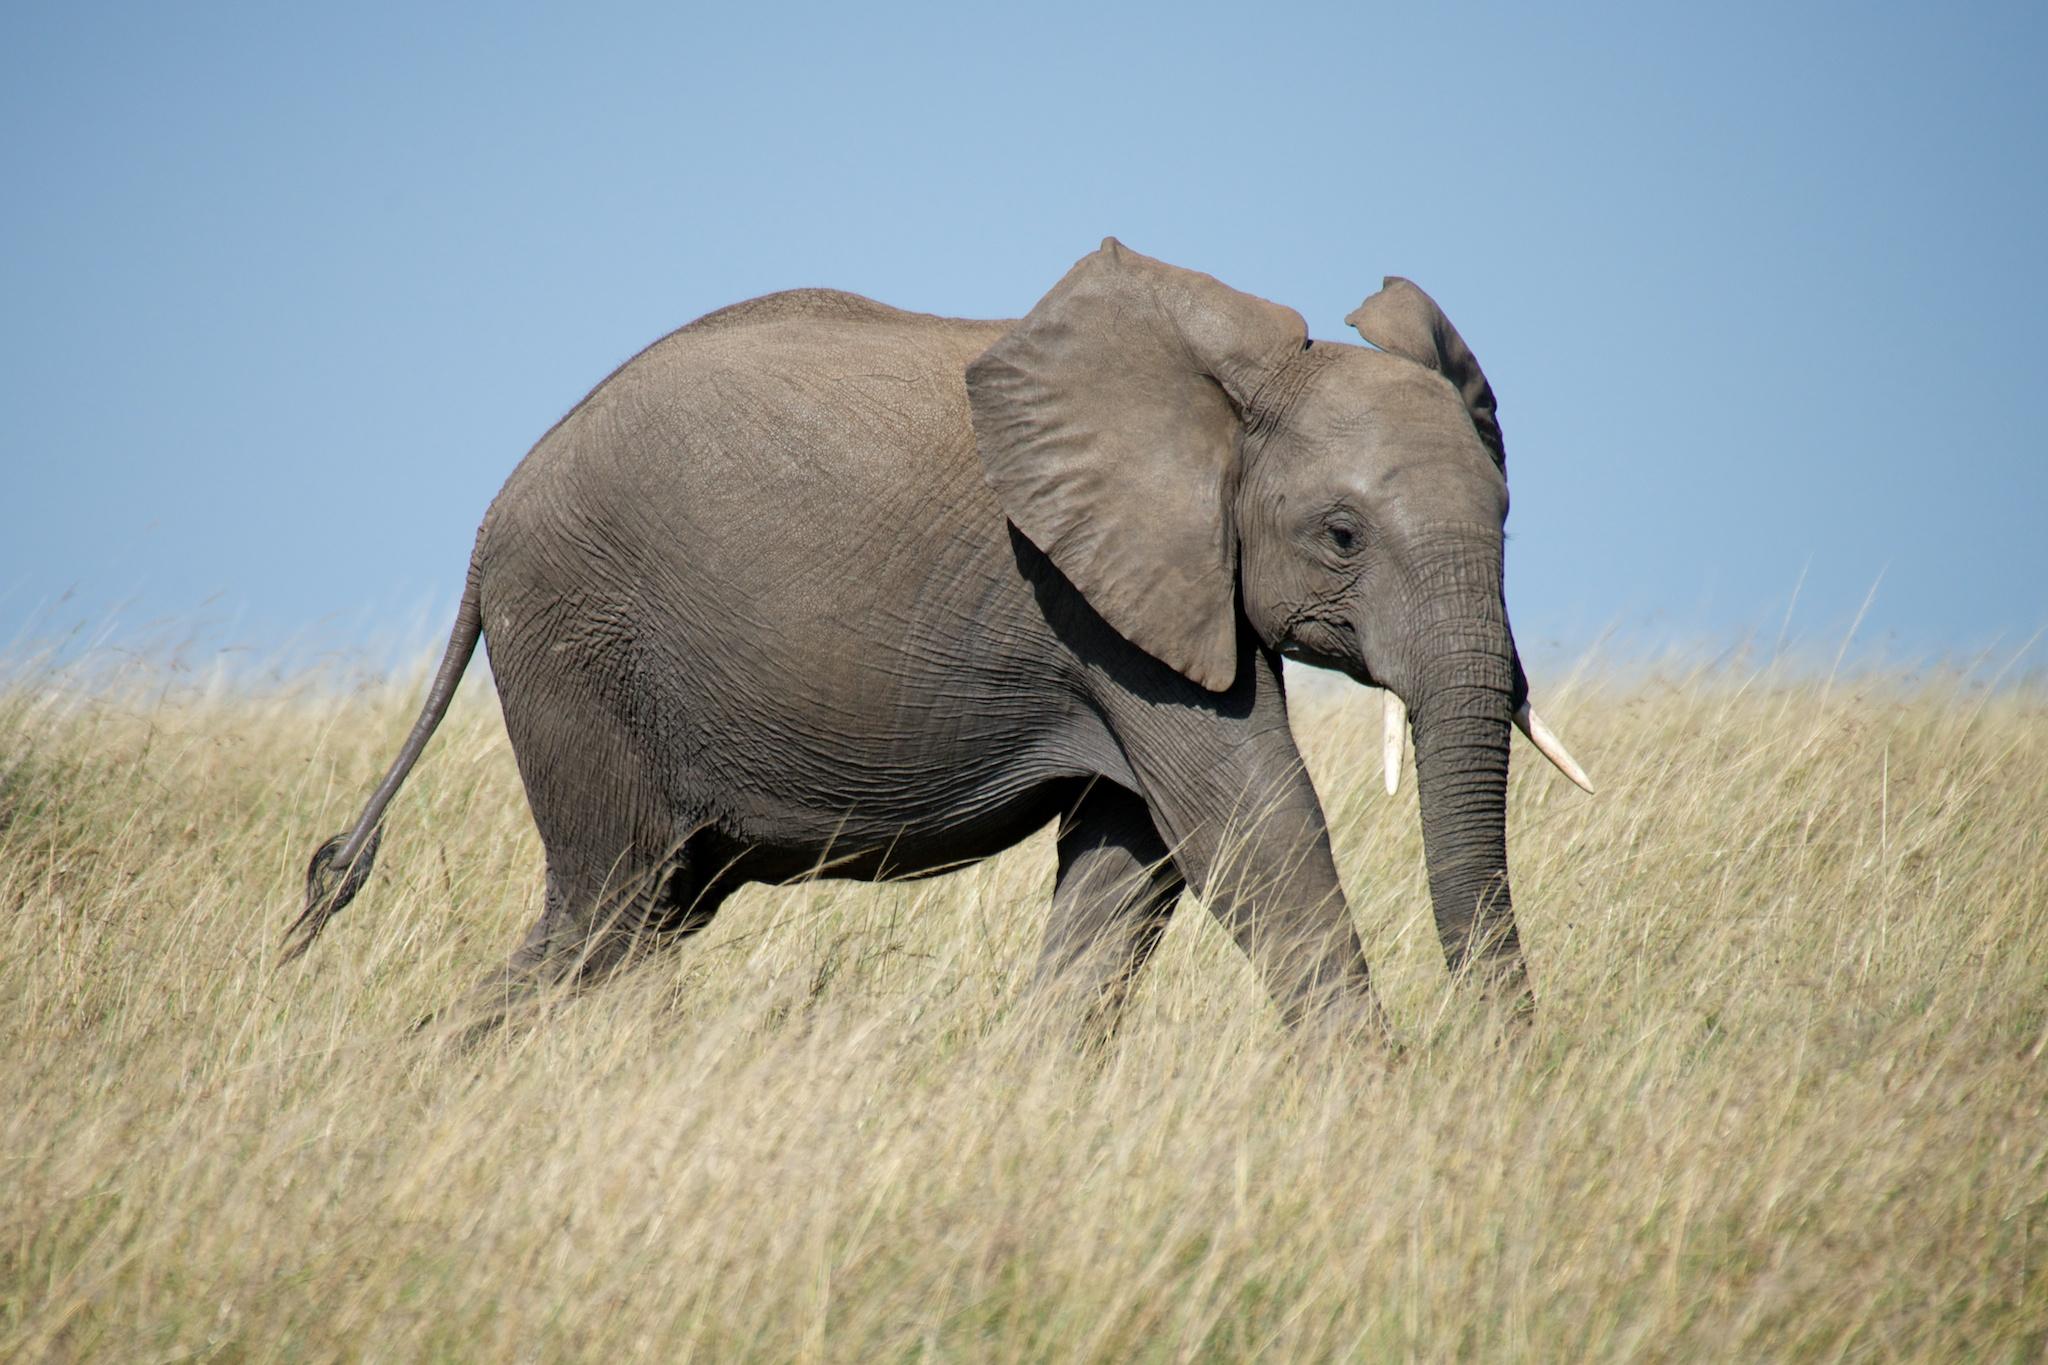 #4: Elephant